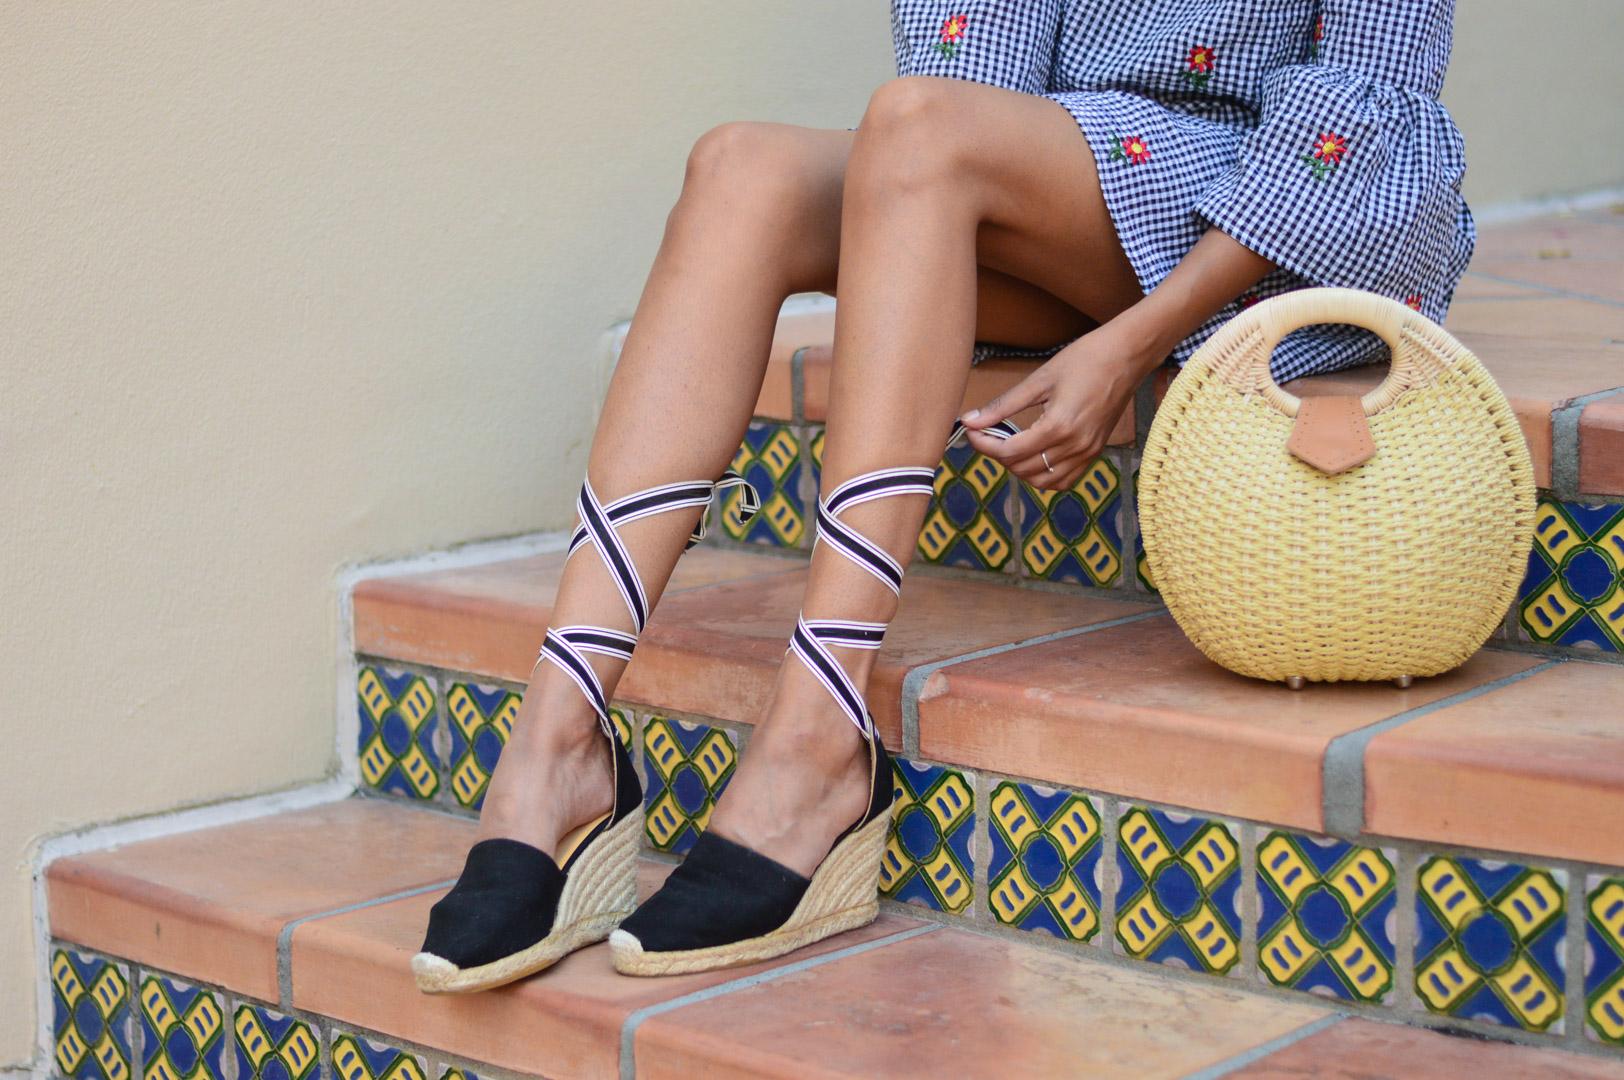 gingham-embroidered-dress-summer-trends-fashion-blogger-espadrilles-wicker-bag 4